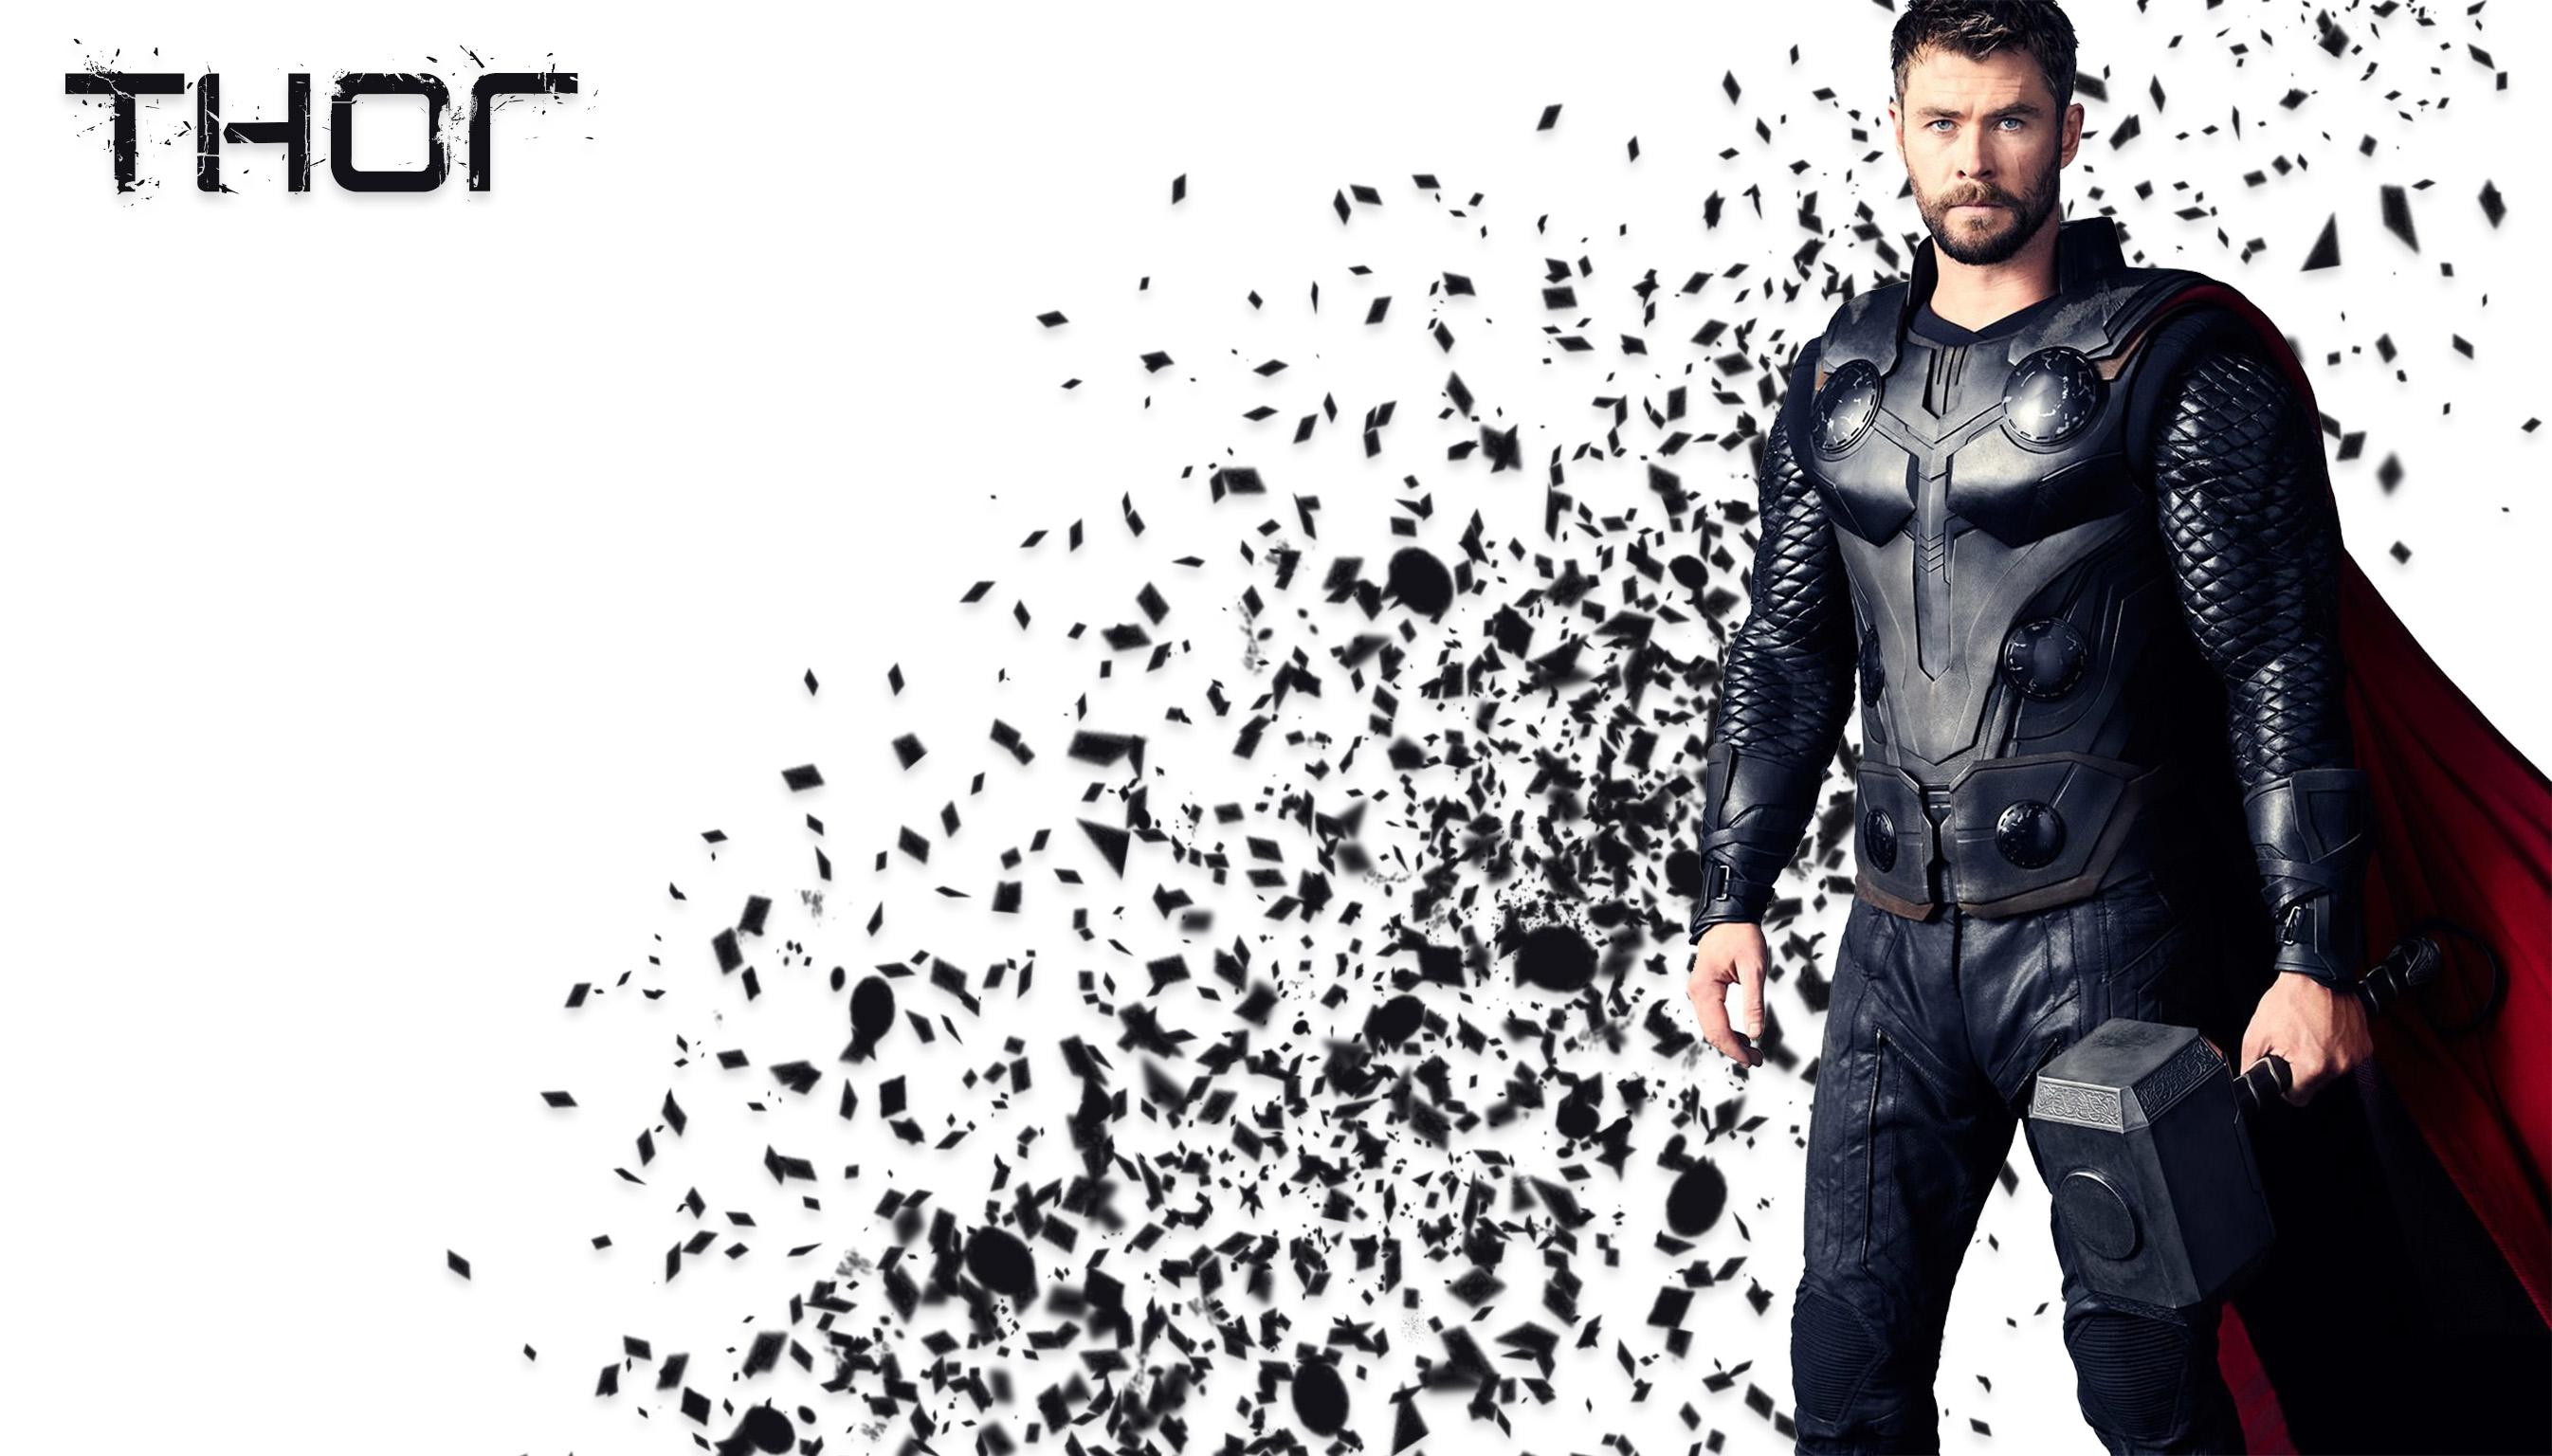 Wallpaper Avengers Infinity War Thor Chris Hemsworth The